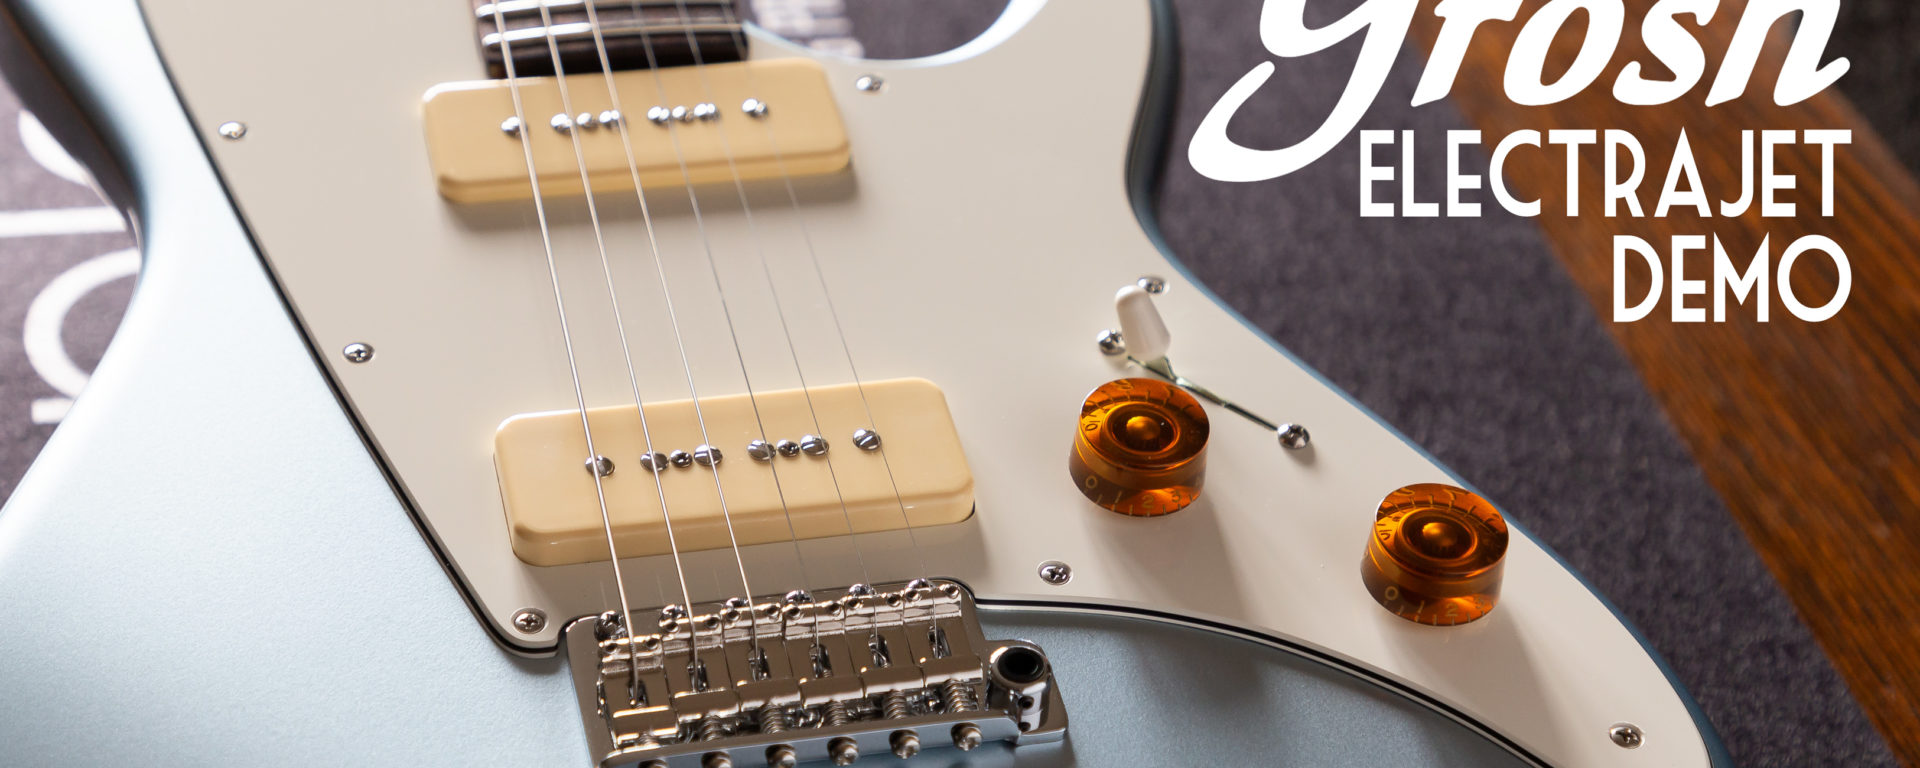 Don Grosh Electric Guitars - ElectraJet Ice Metallic Blue - Short Scale